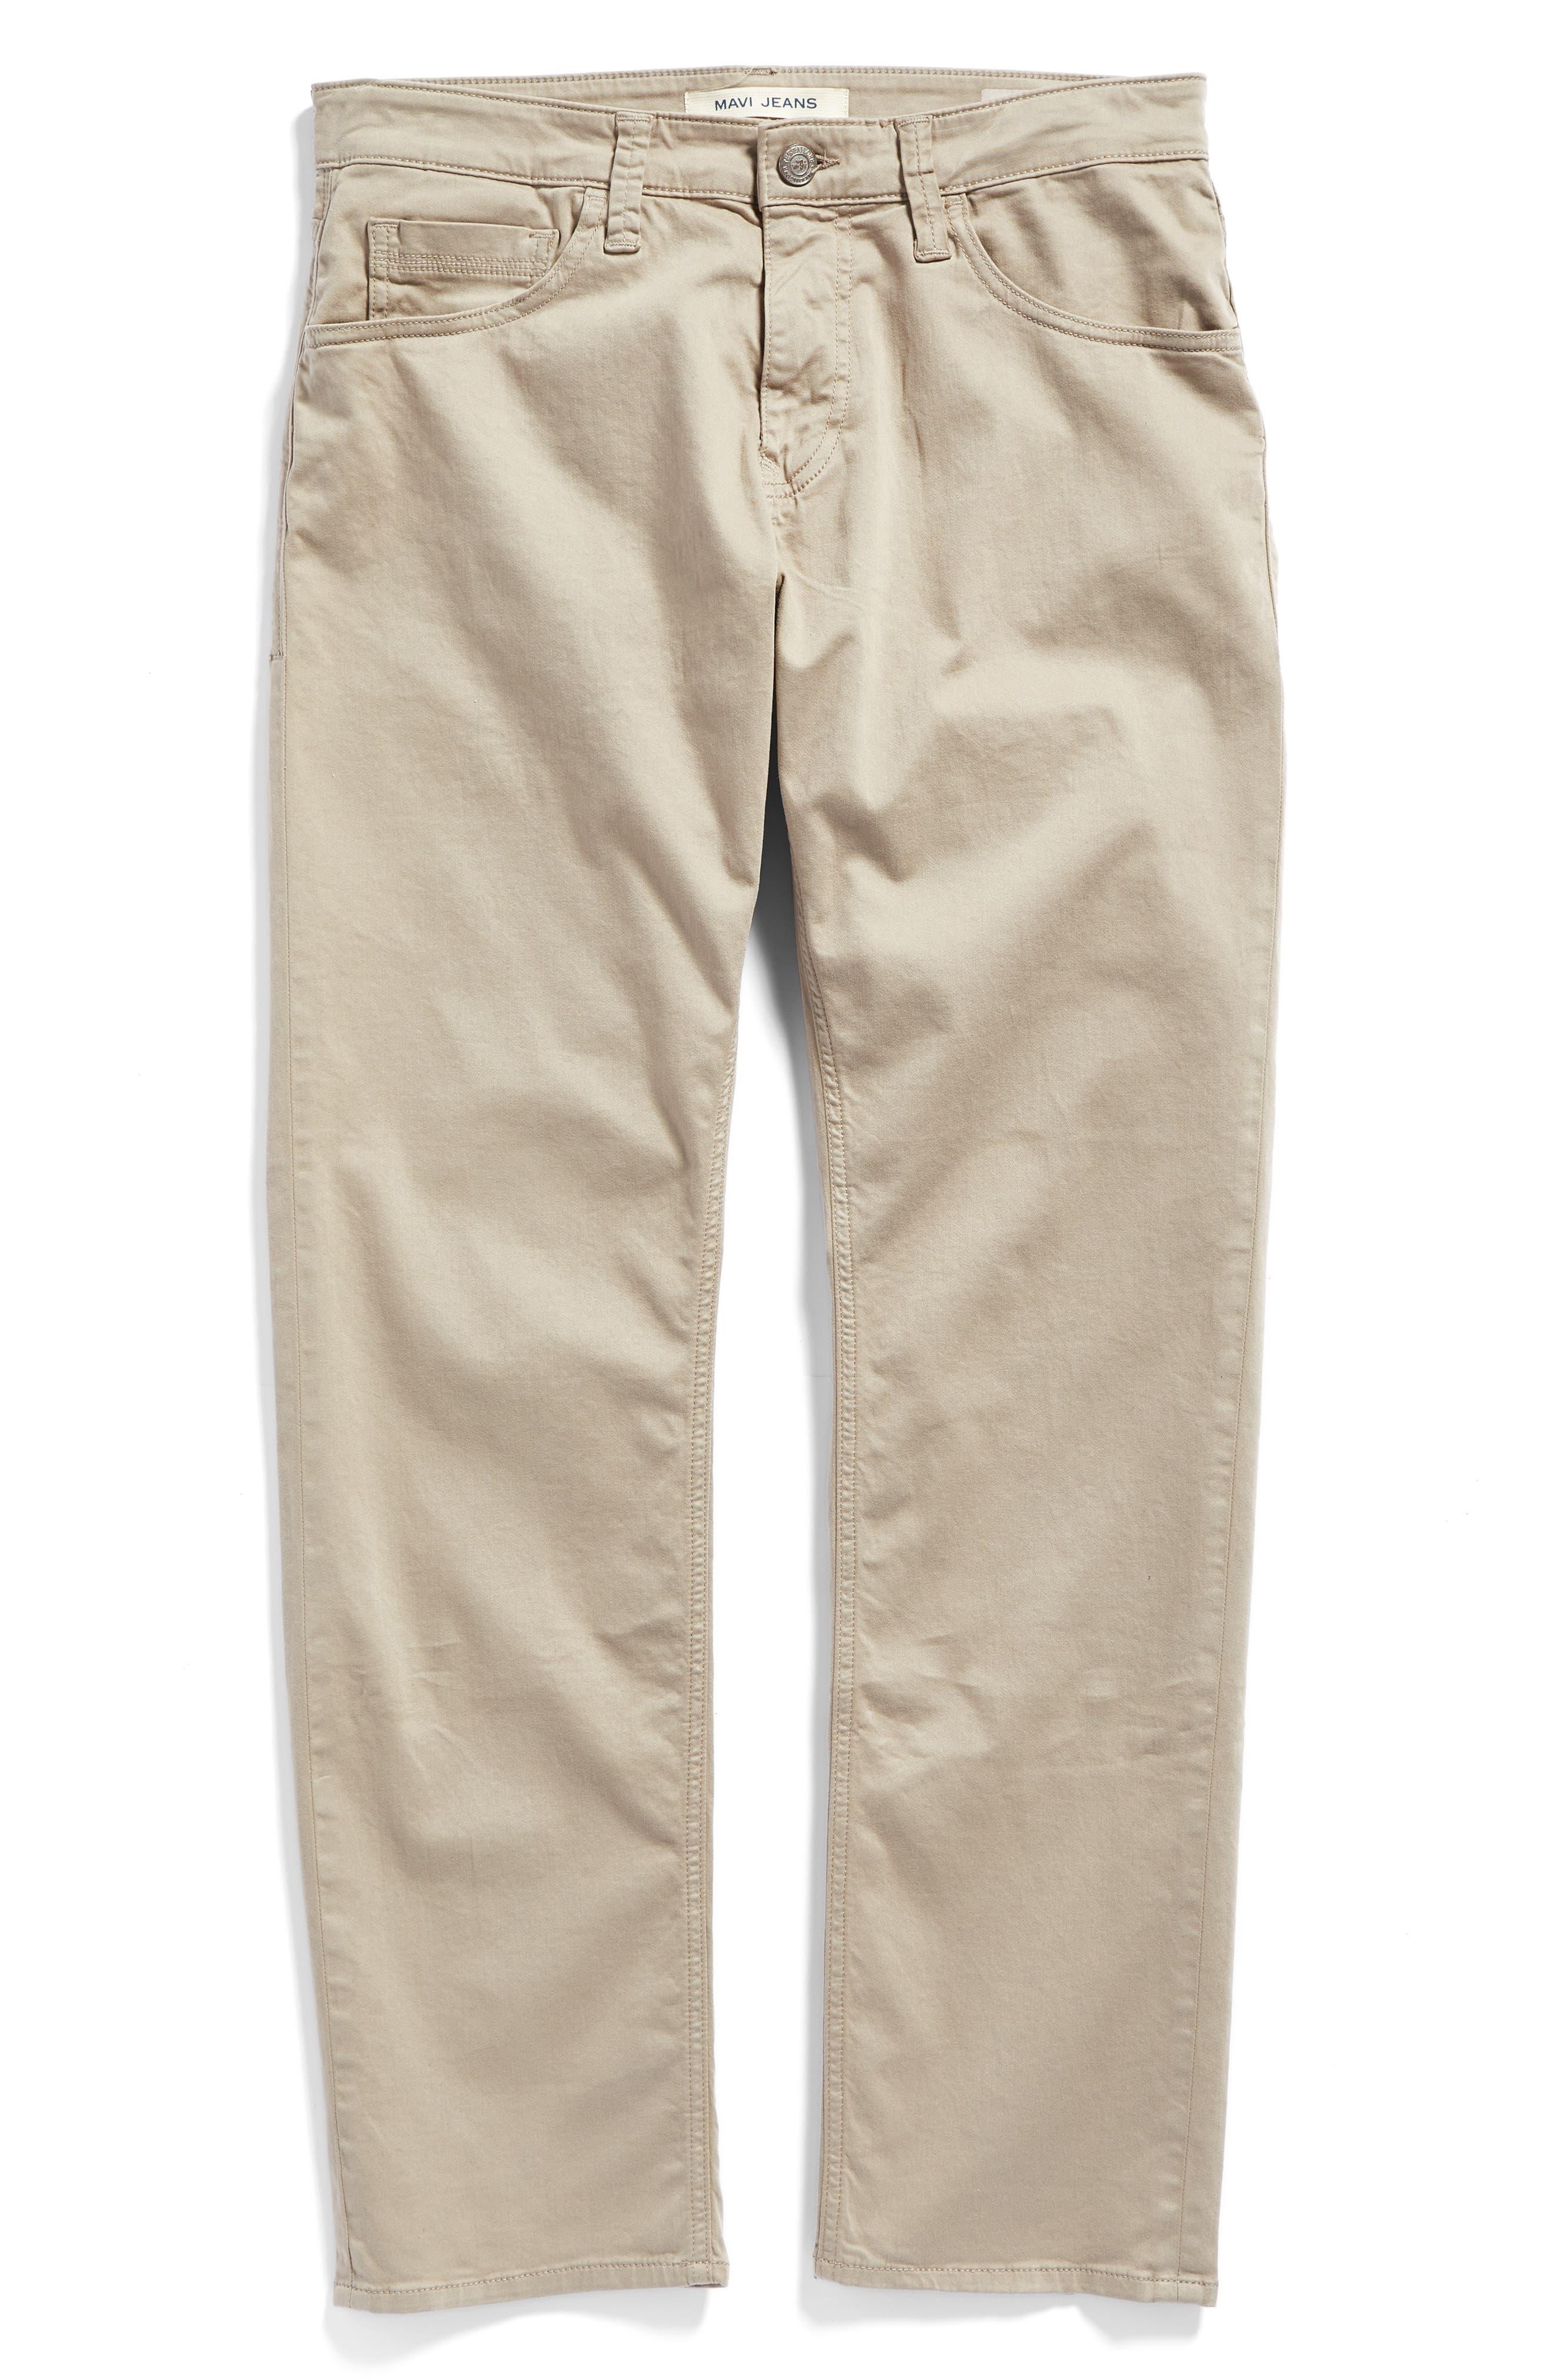 Zach Straight Leg Twill Pants,                             Alternate thumbnail 6, color,                             Beige Twill